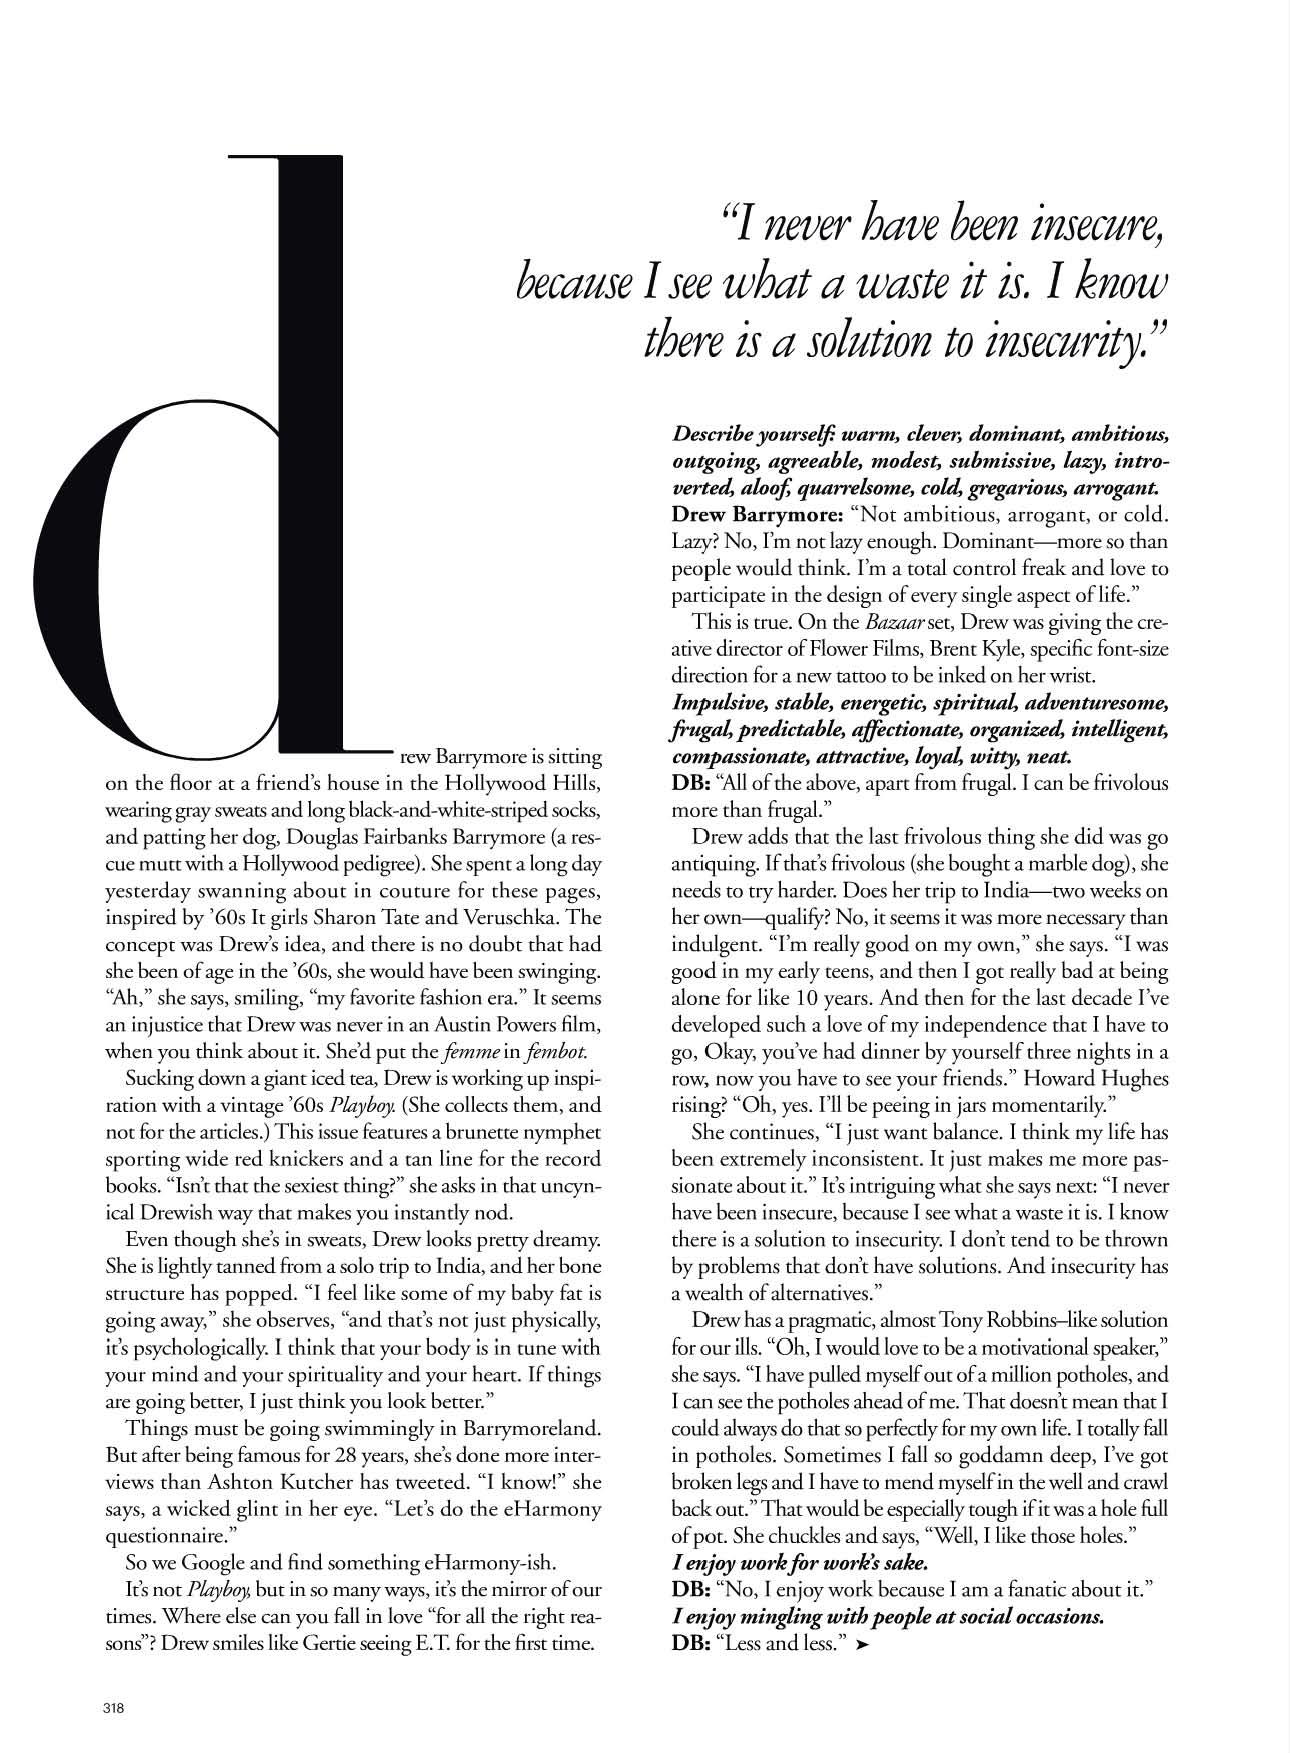 drew-barrymore-harpers-bazaar-magazine-oct-2010-issue-13